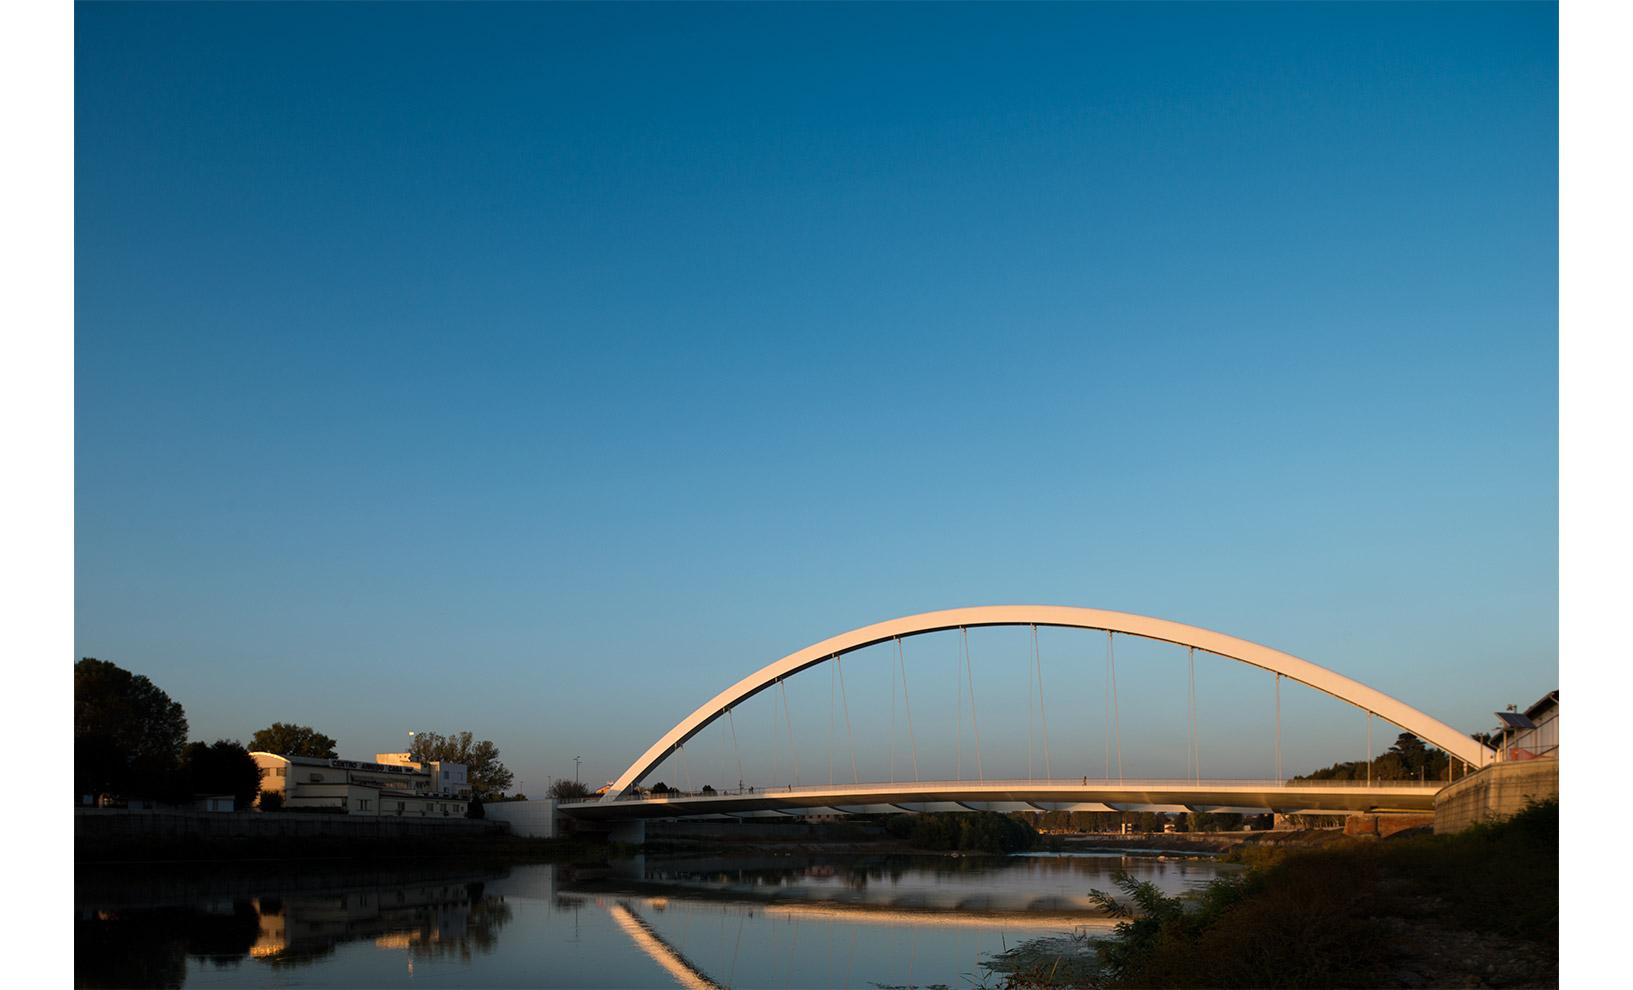 ©marco-tacchini-fotografo-ponte-cittadella-richar-meier-and-partners_19